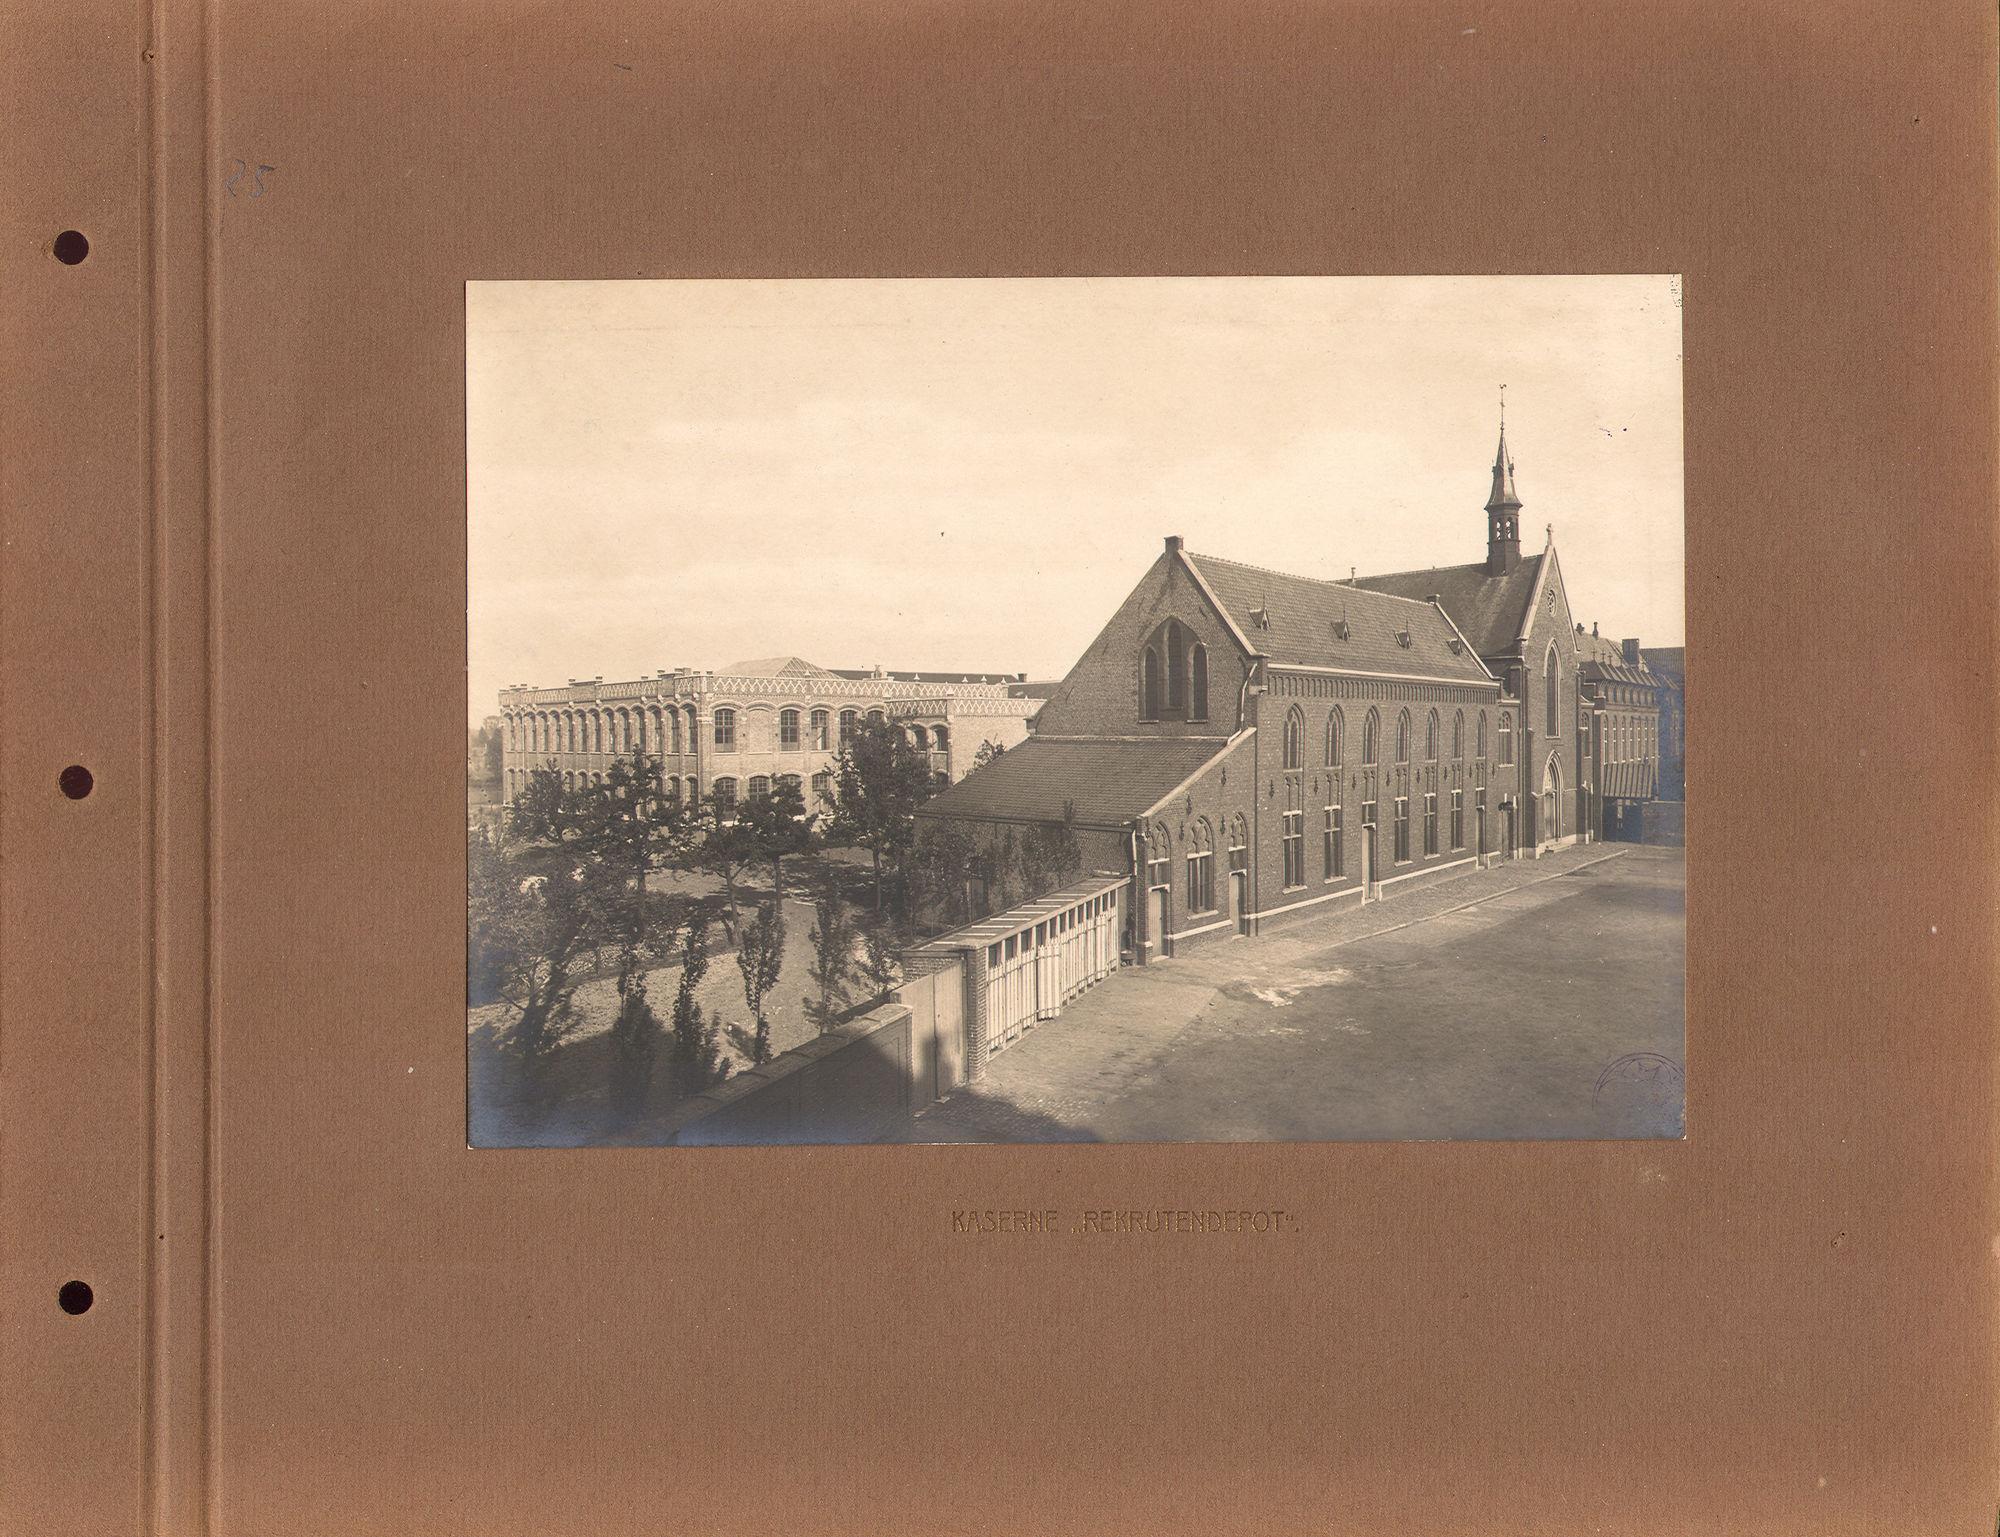 Sint-Amandscollege in 1916